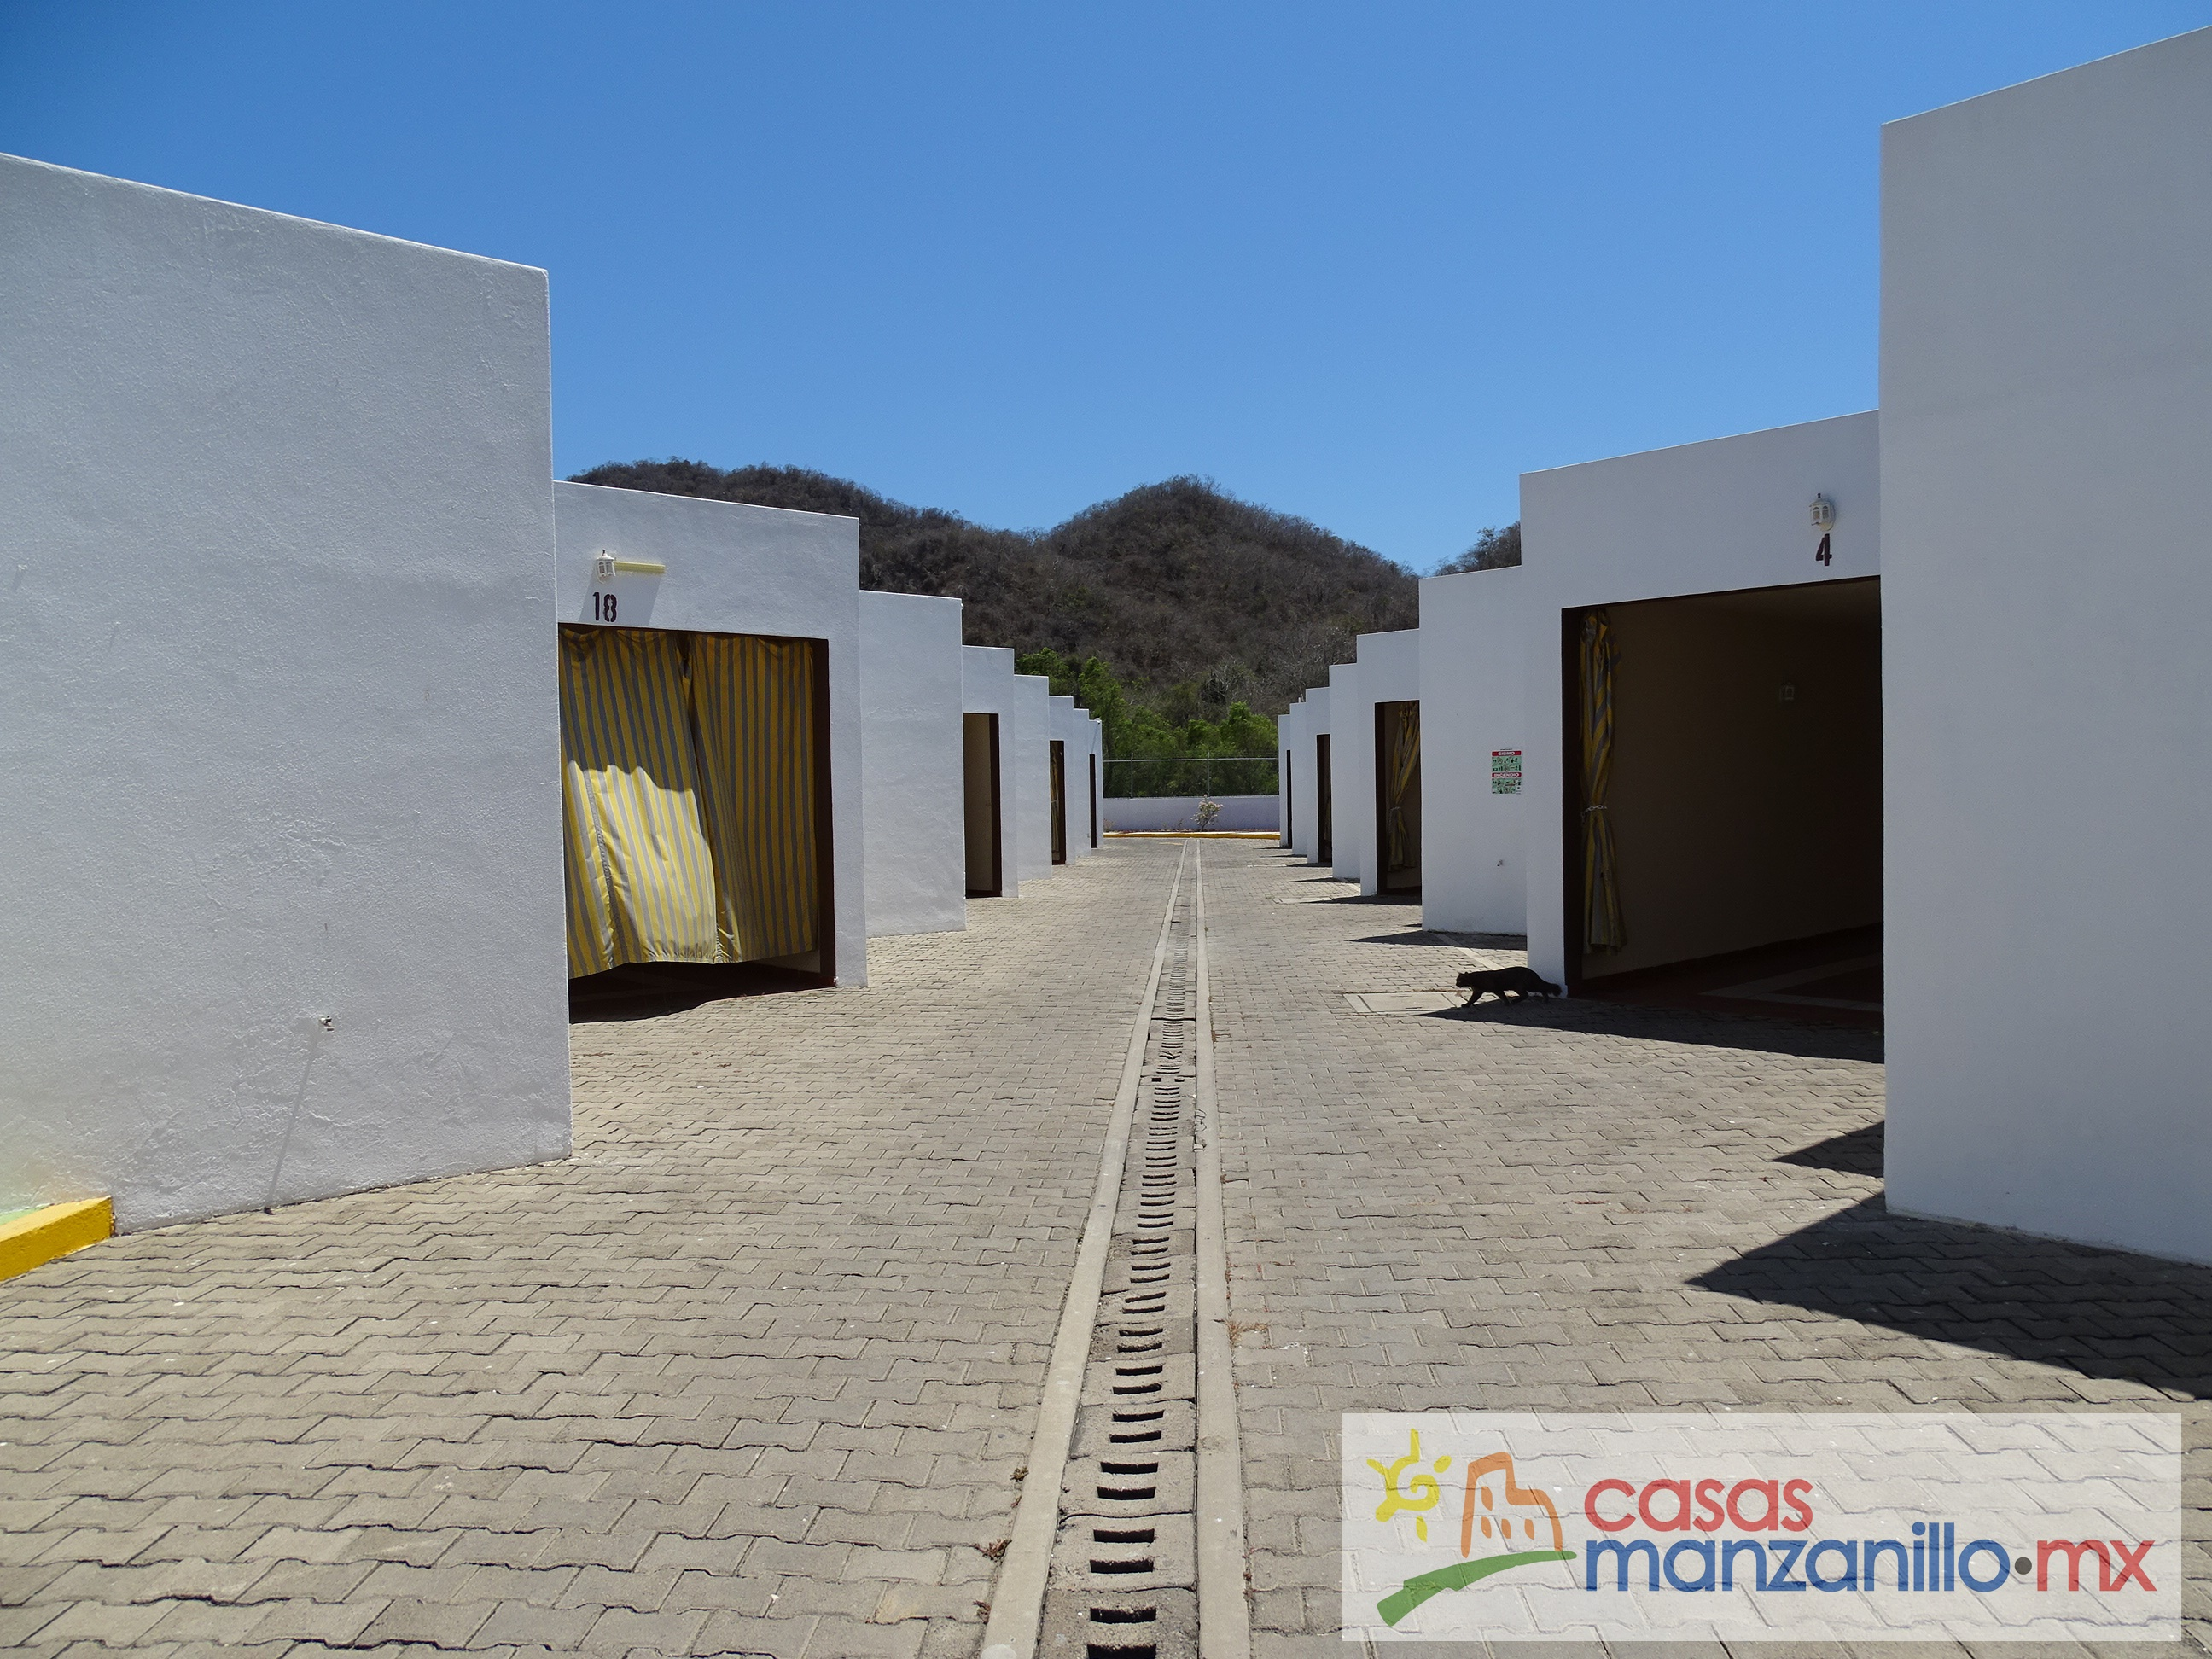 Motel VENTA Manzanillo - Dunas (1)